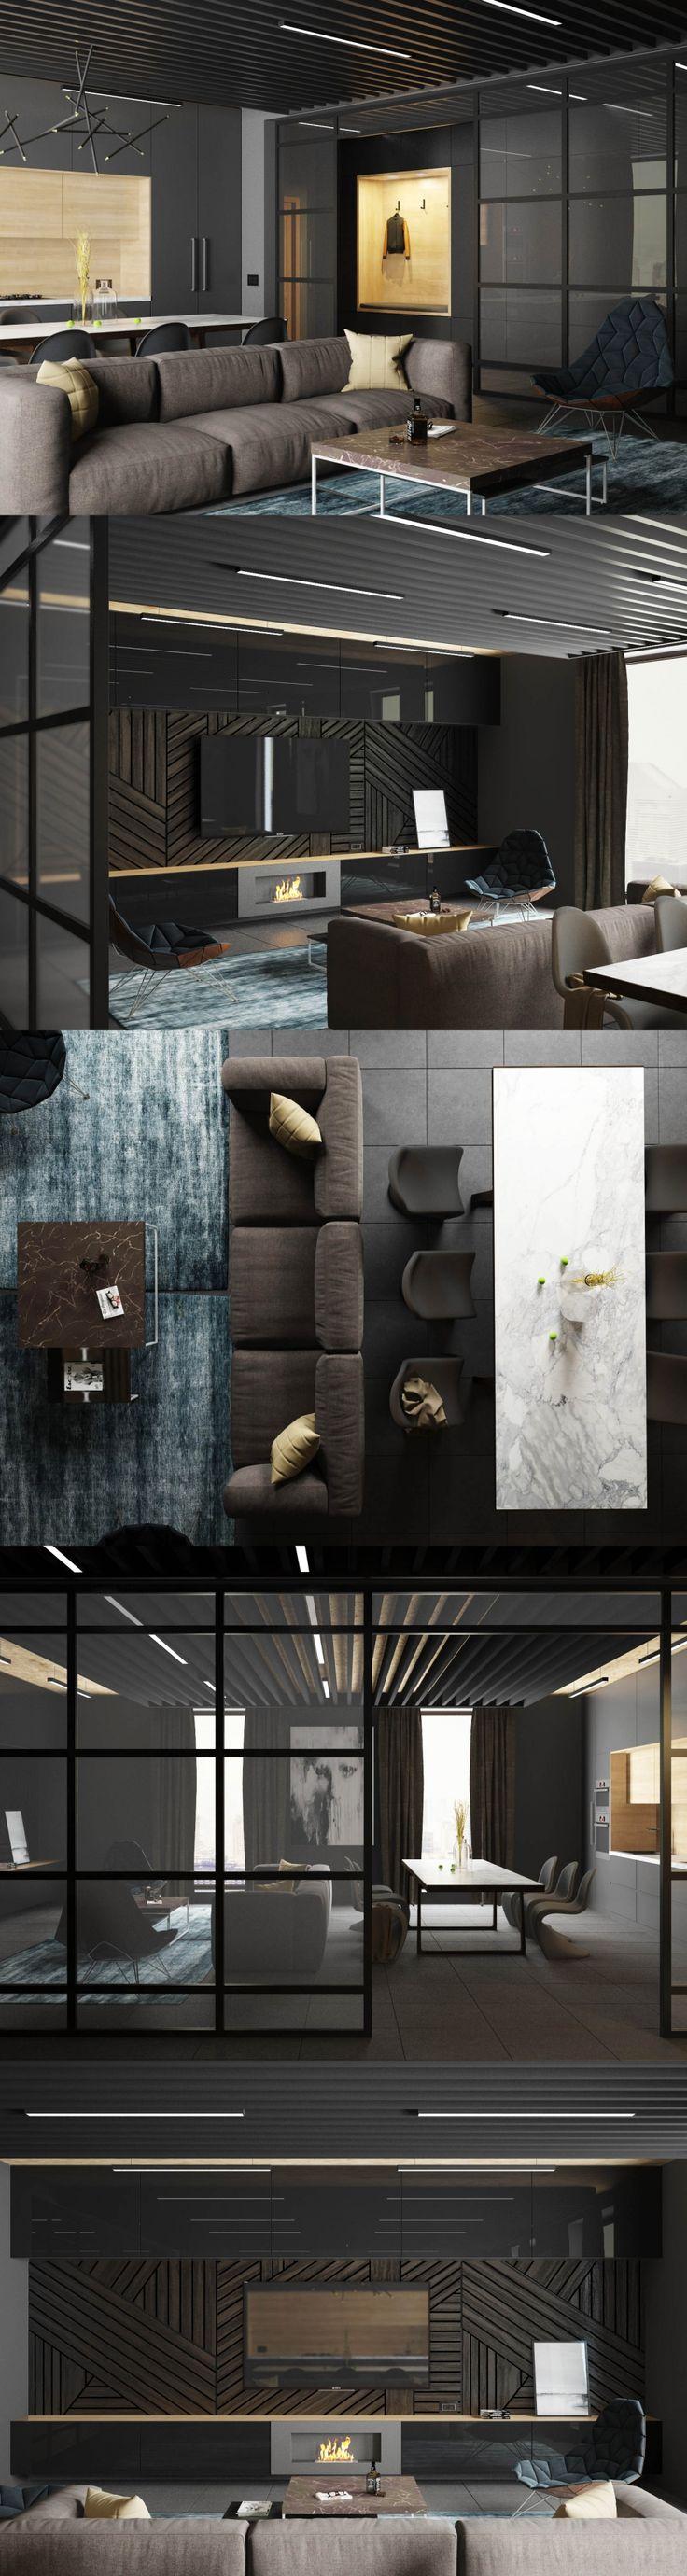 Man's apartments - Галерея 3ddd.ru #contemporarylivingroomdesigns